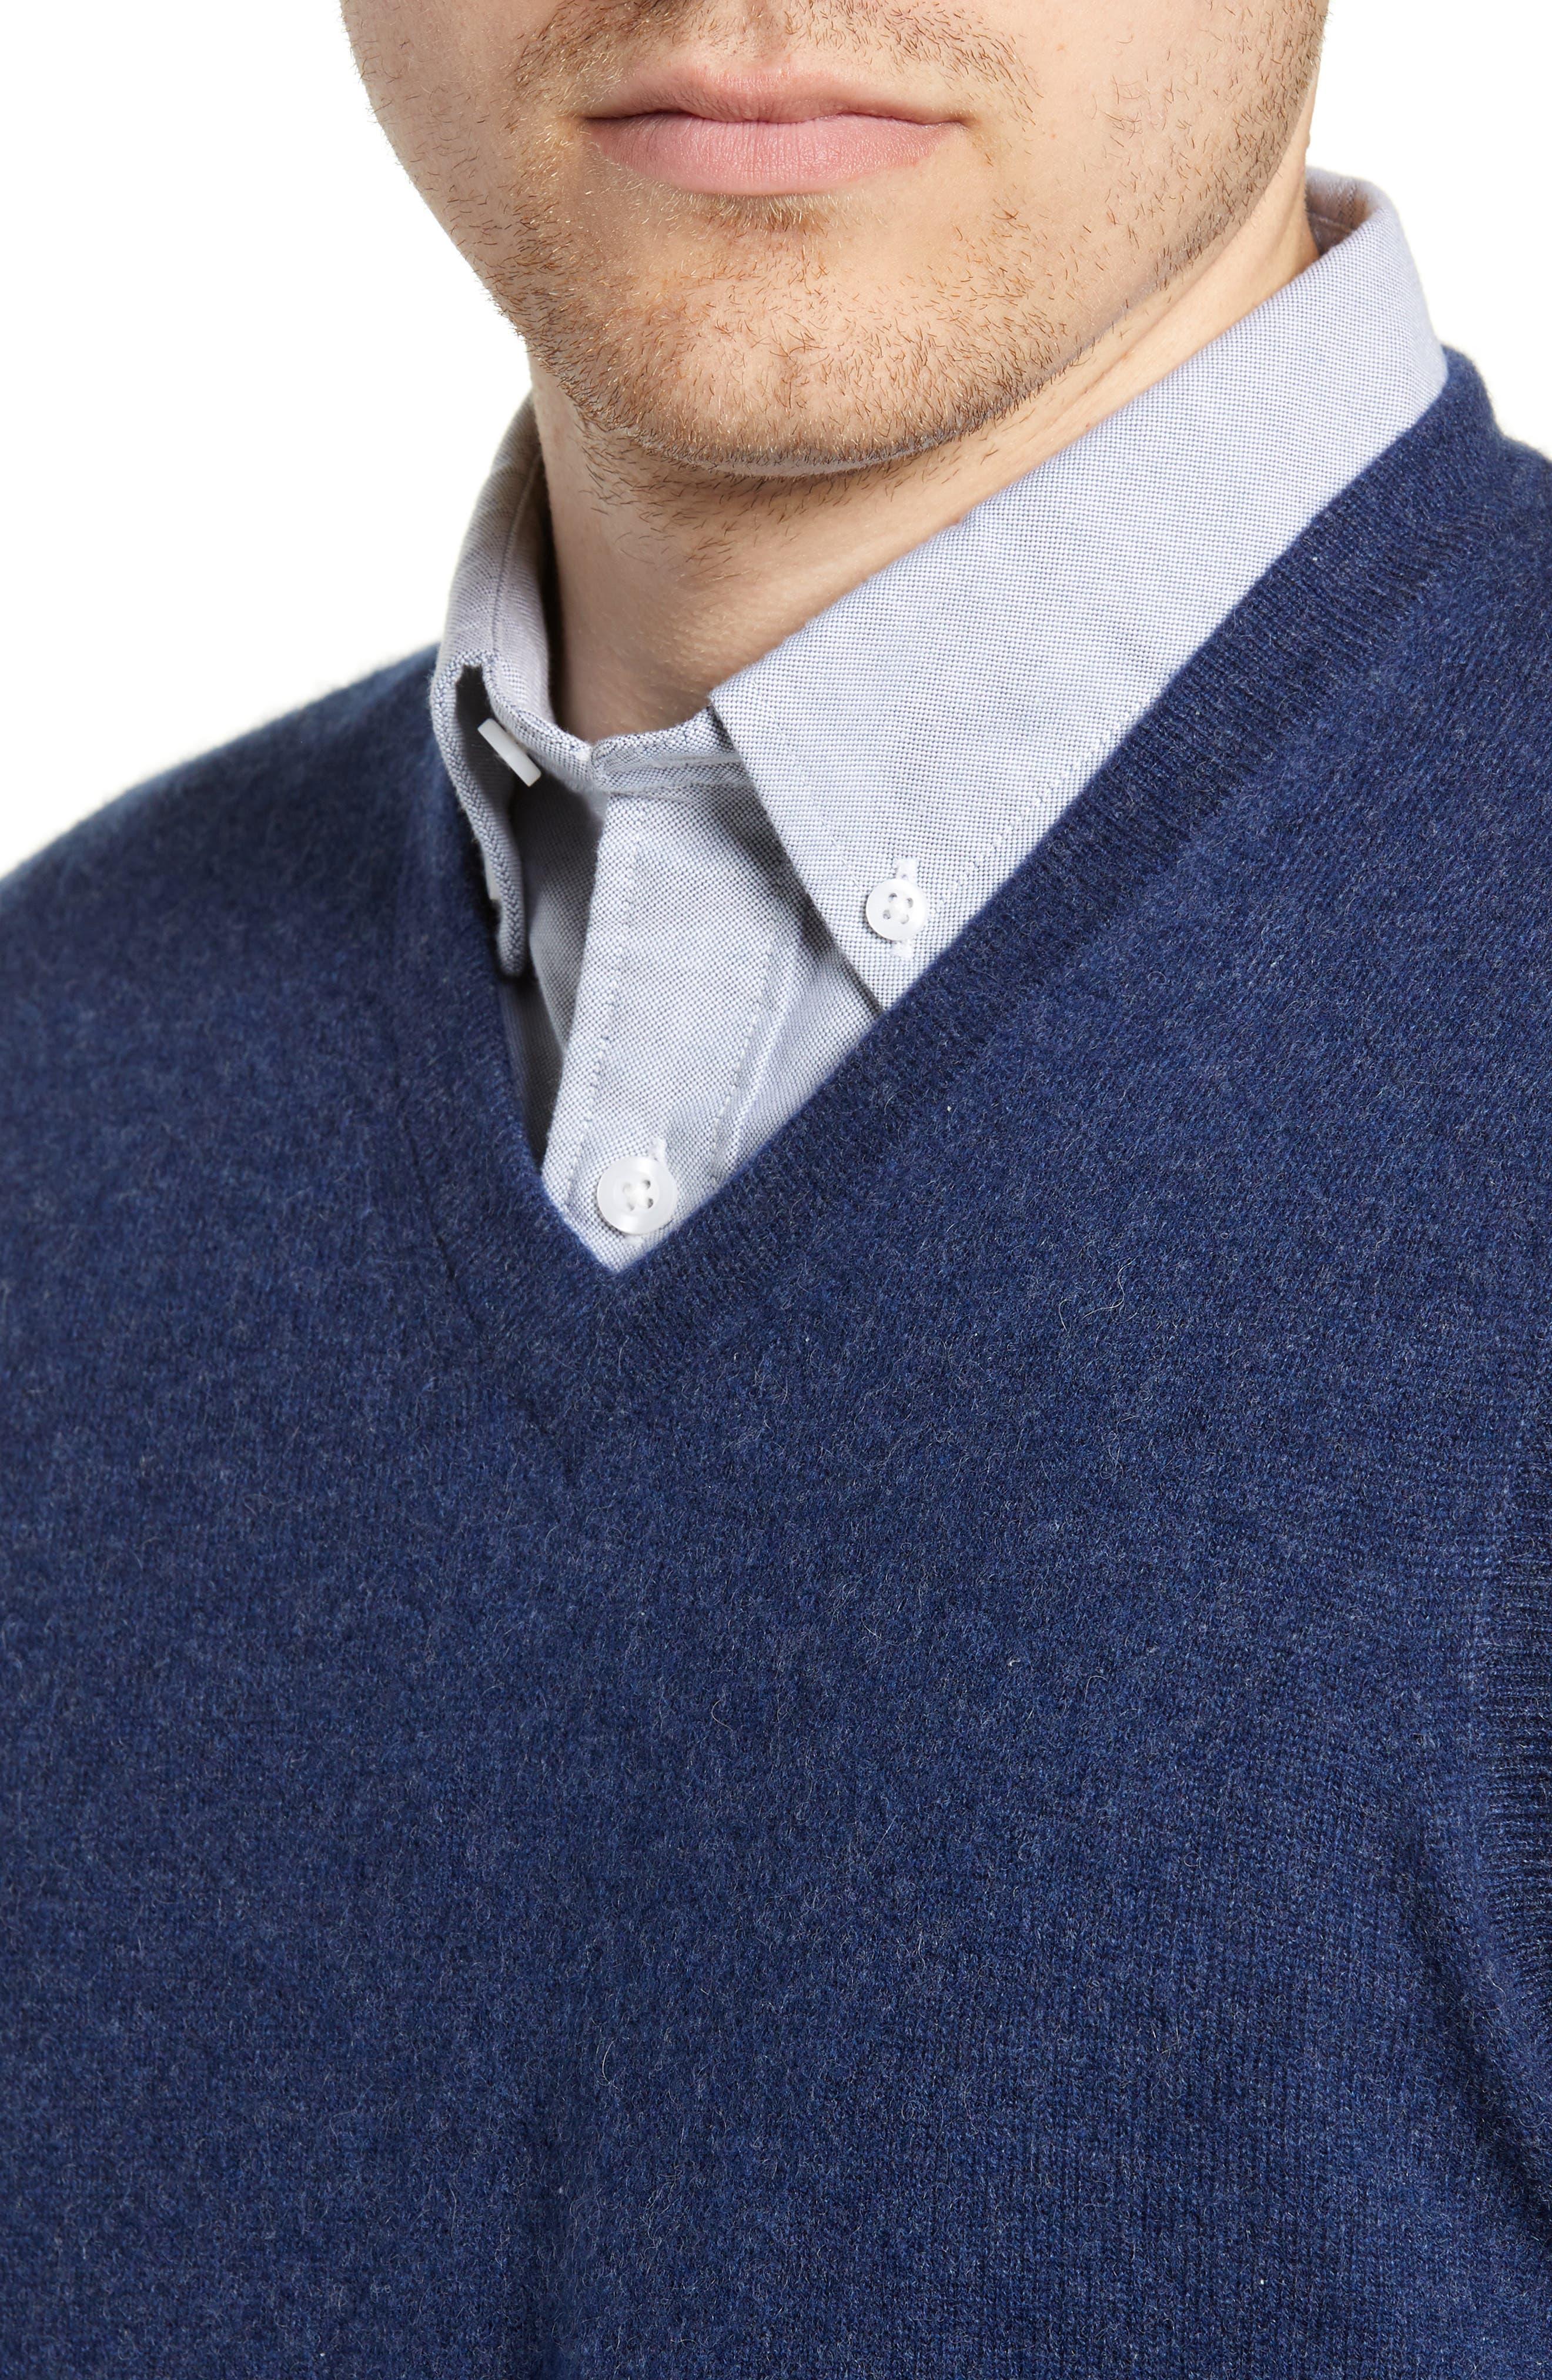 Cashmere V-Neck Sweater Vest,                             Alternate thumbnail 4, color,                             BLUE ESTATE HEATHER